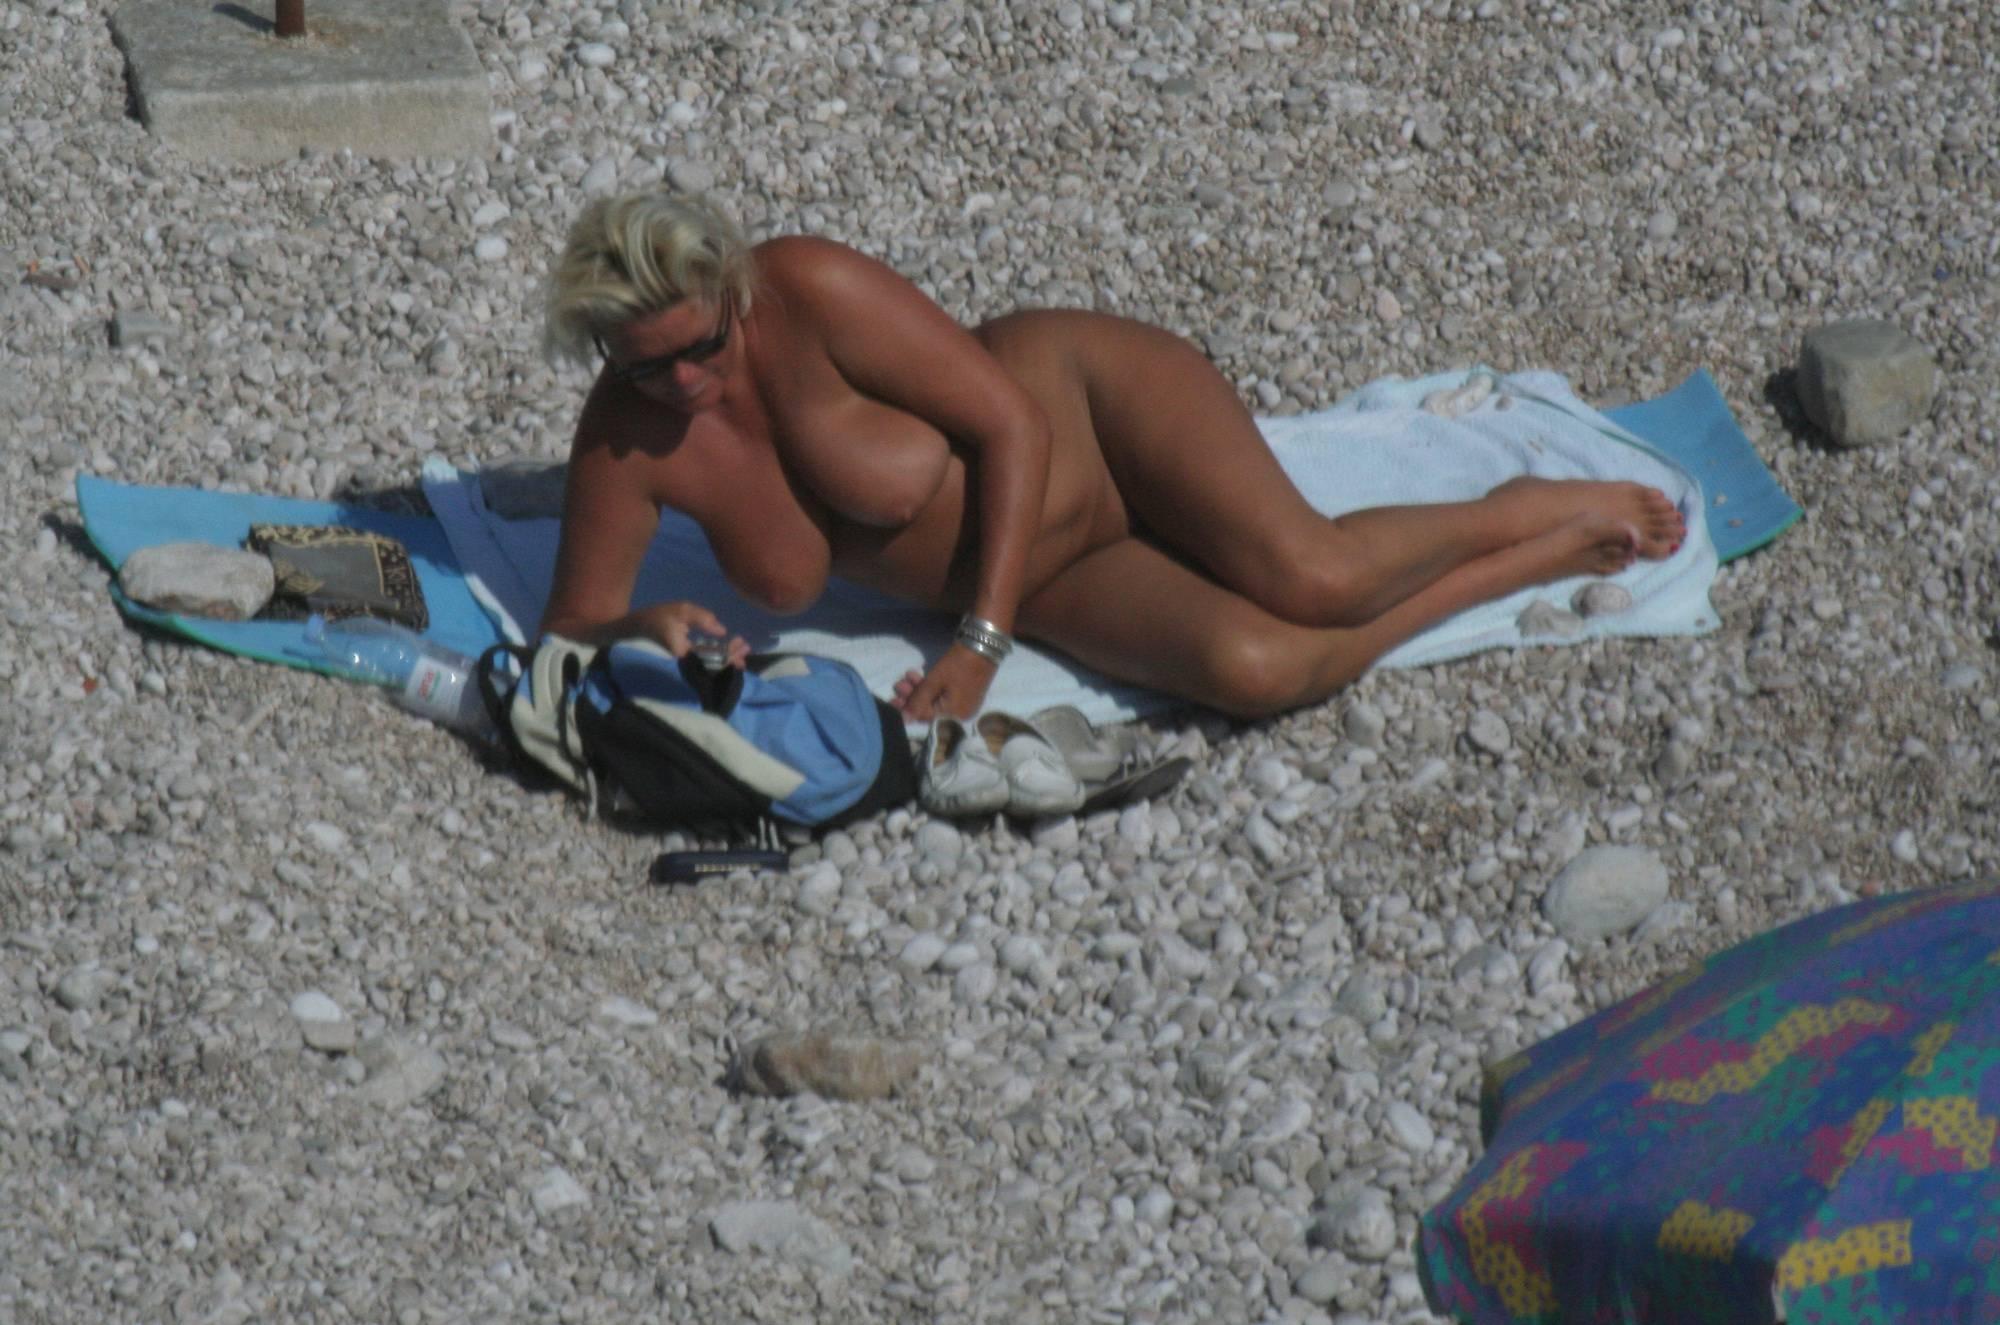 Croatian Baska Beach Day - 1